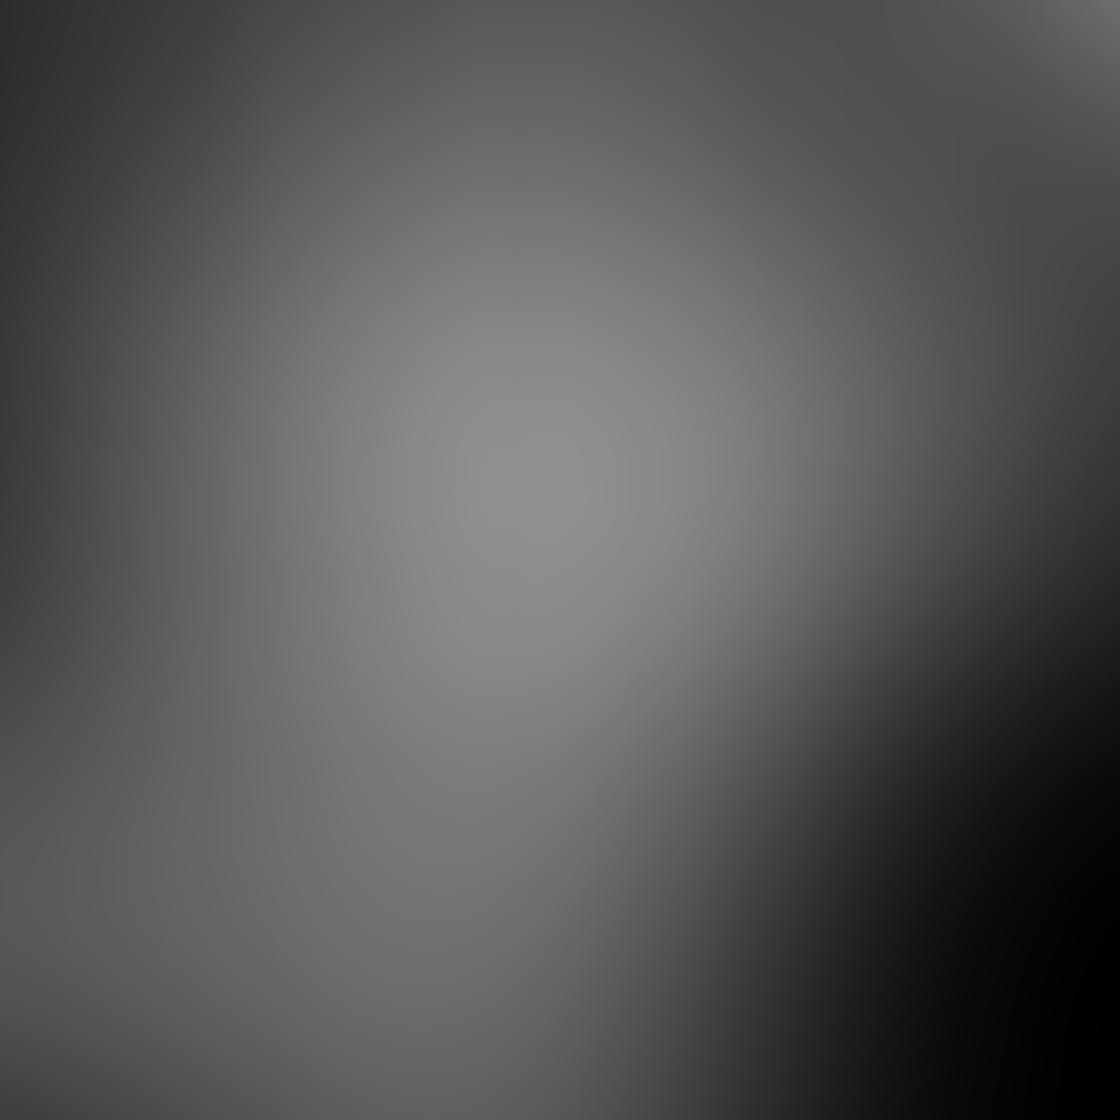 iPhone Photo Black White 27